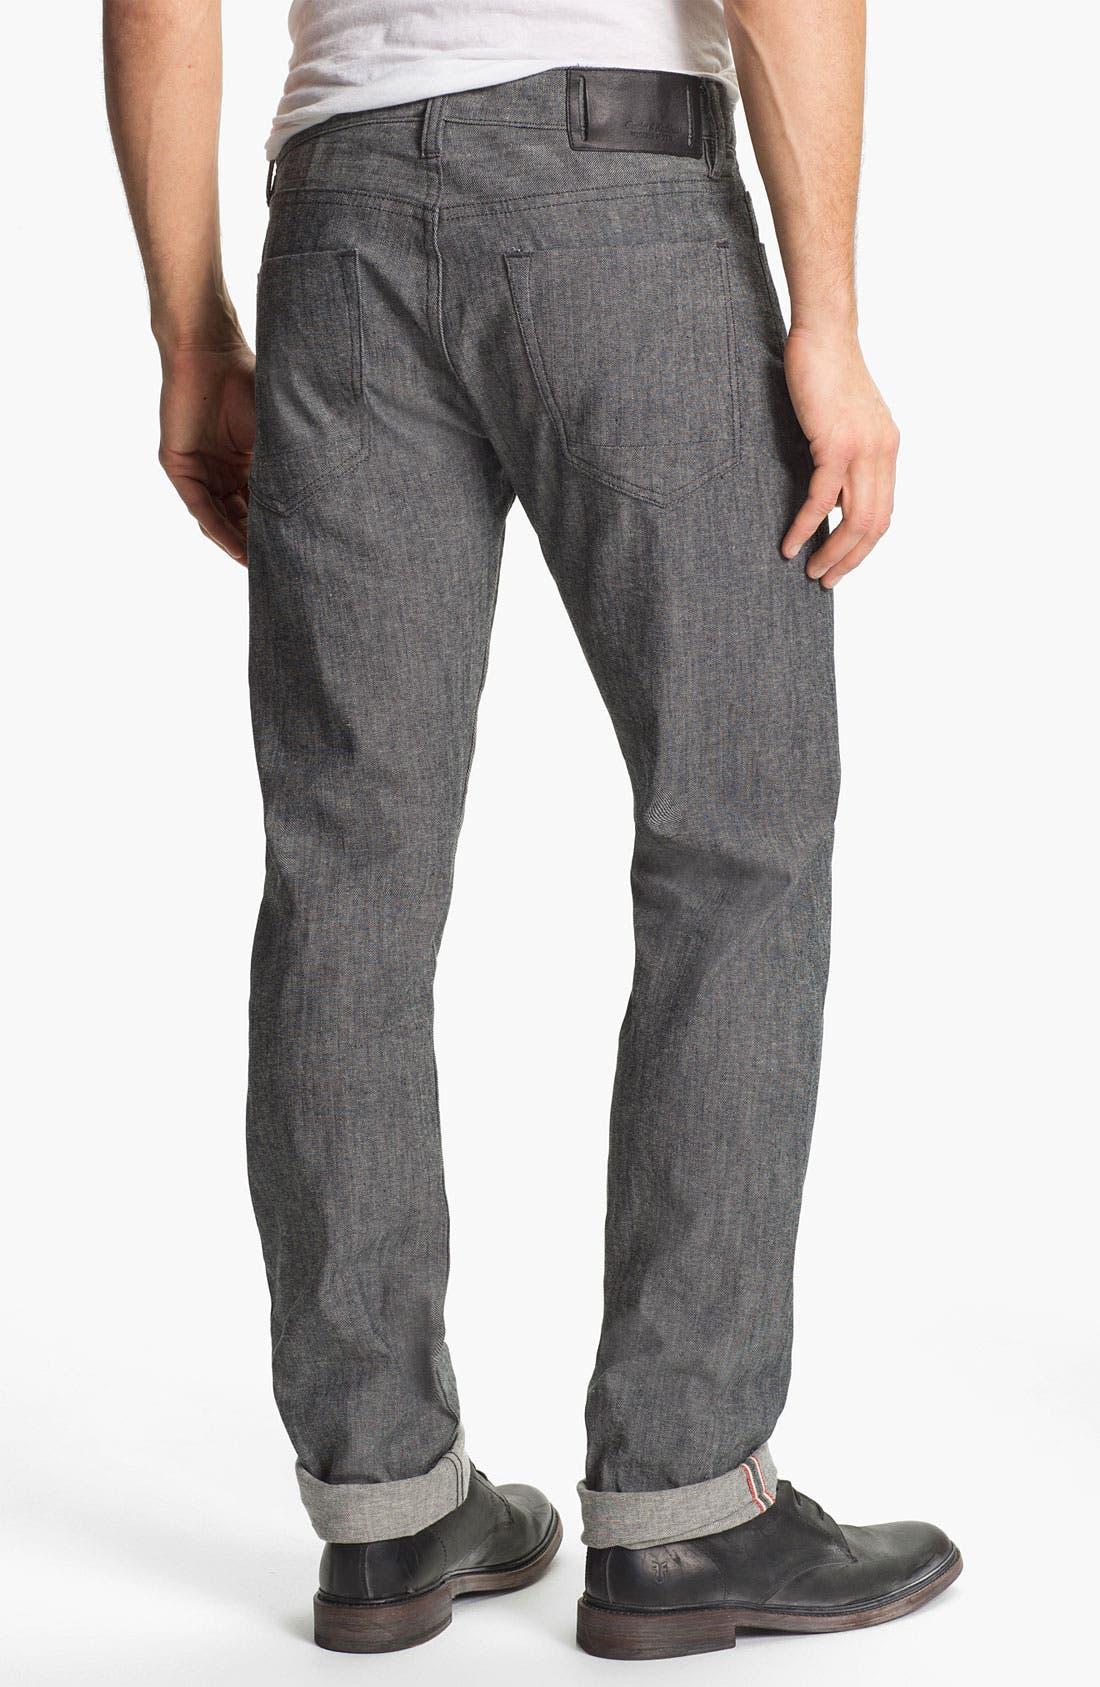 Alternate Image 1 Selected - Denim & Leathers by Andrew Marc Tweed Slim Straight Leg Selvedge Jeans (Grey)